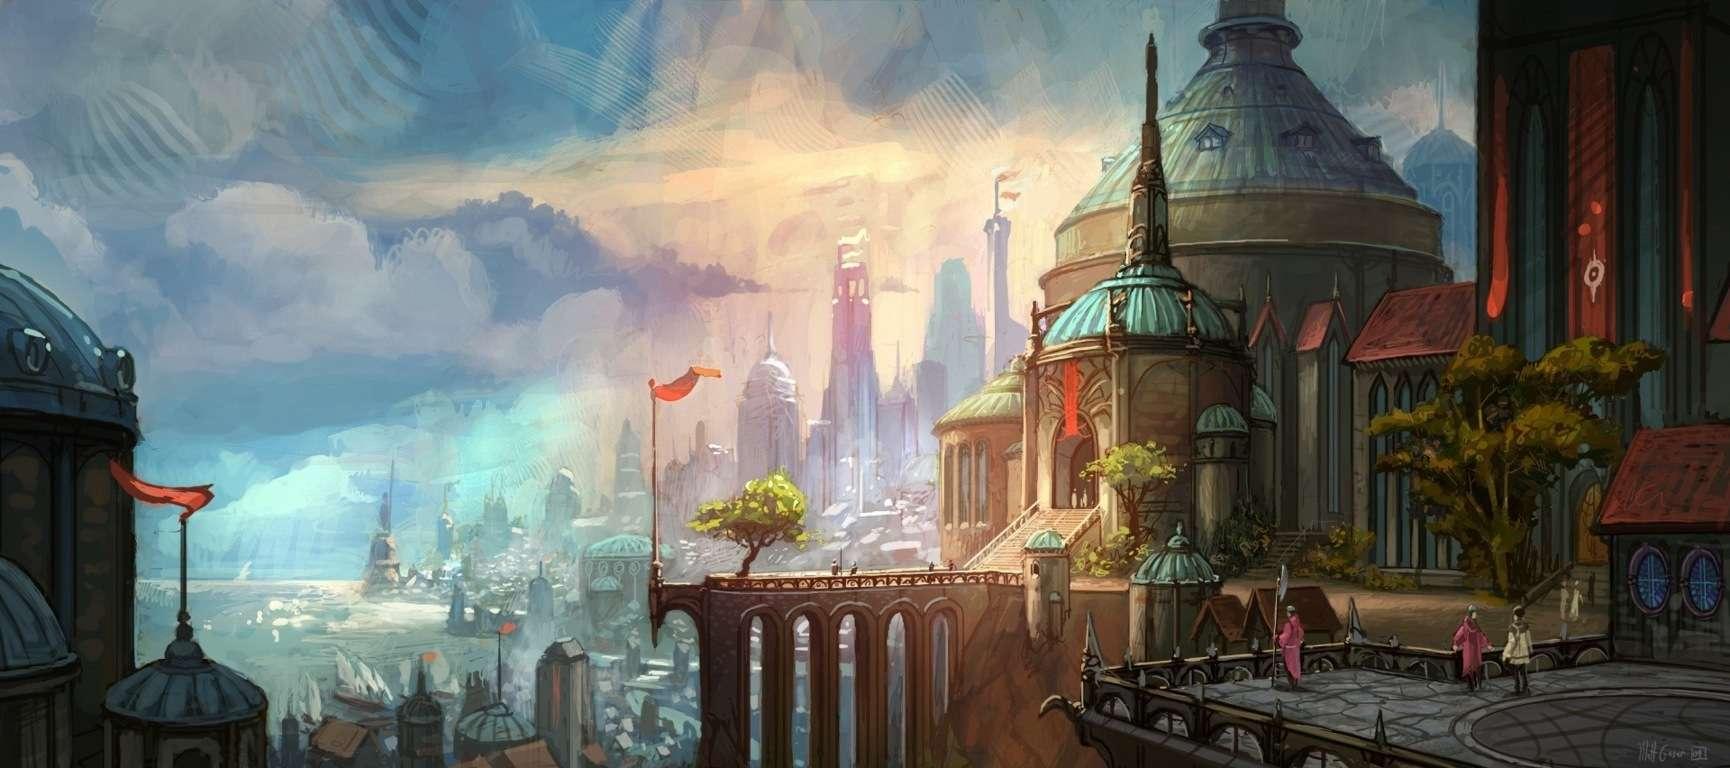 League of Legends Wallpaper 092